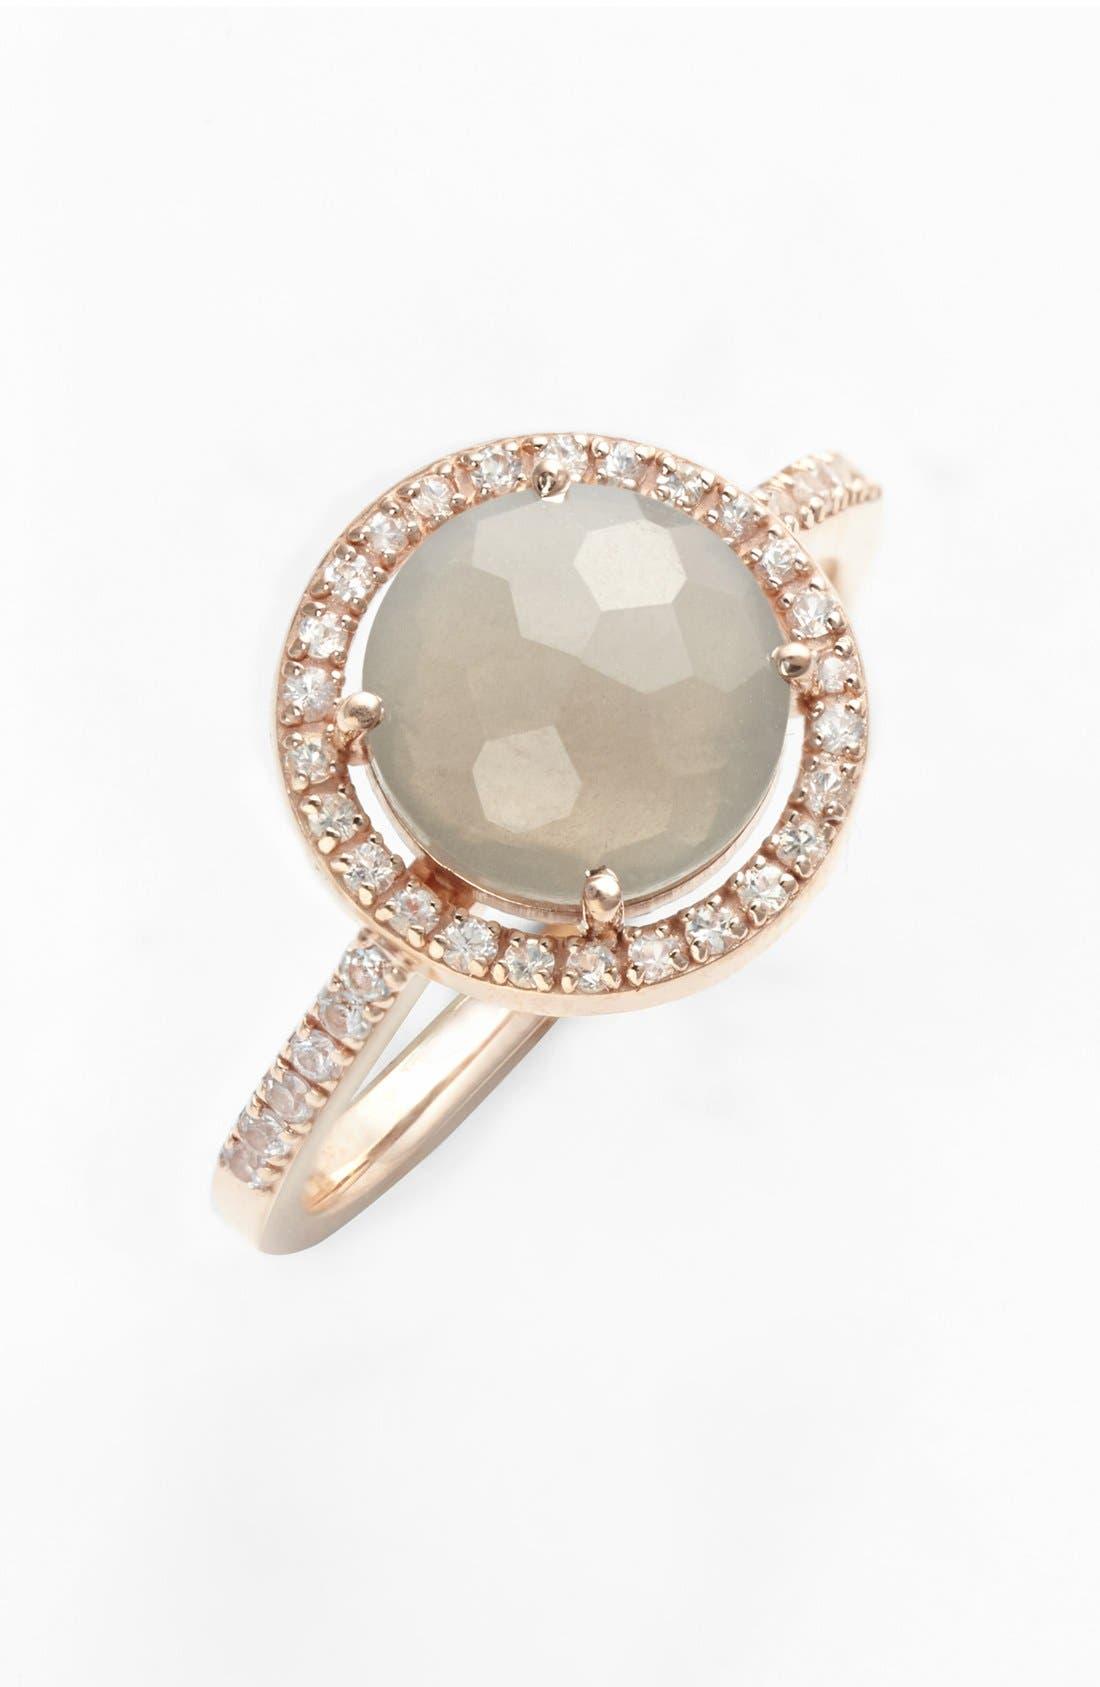 Main Image - KALAN by Suzanne Kalan Round Stone & Sapphire Ring